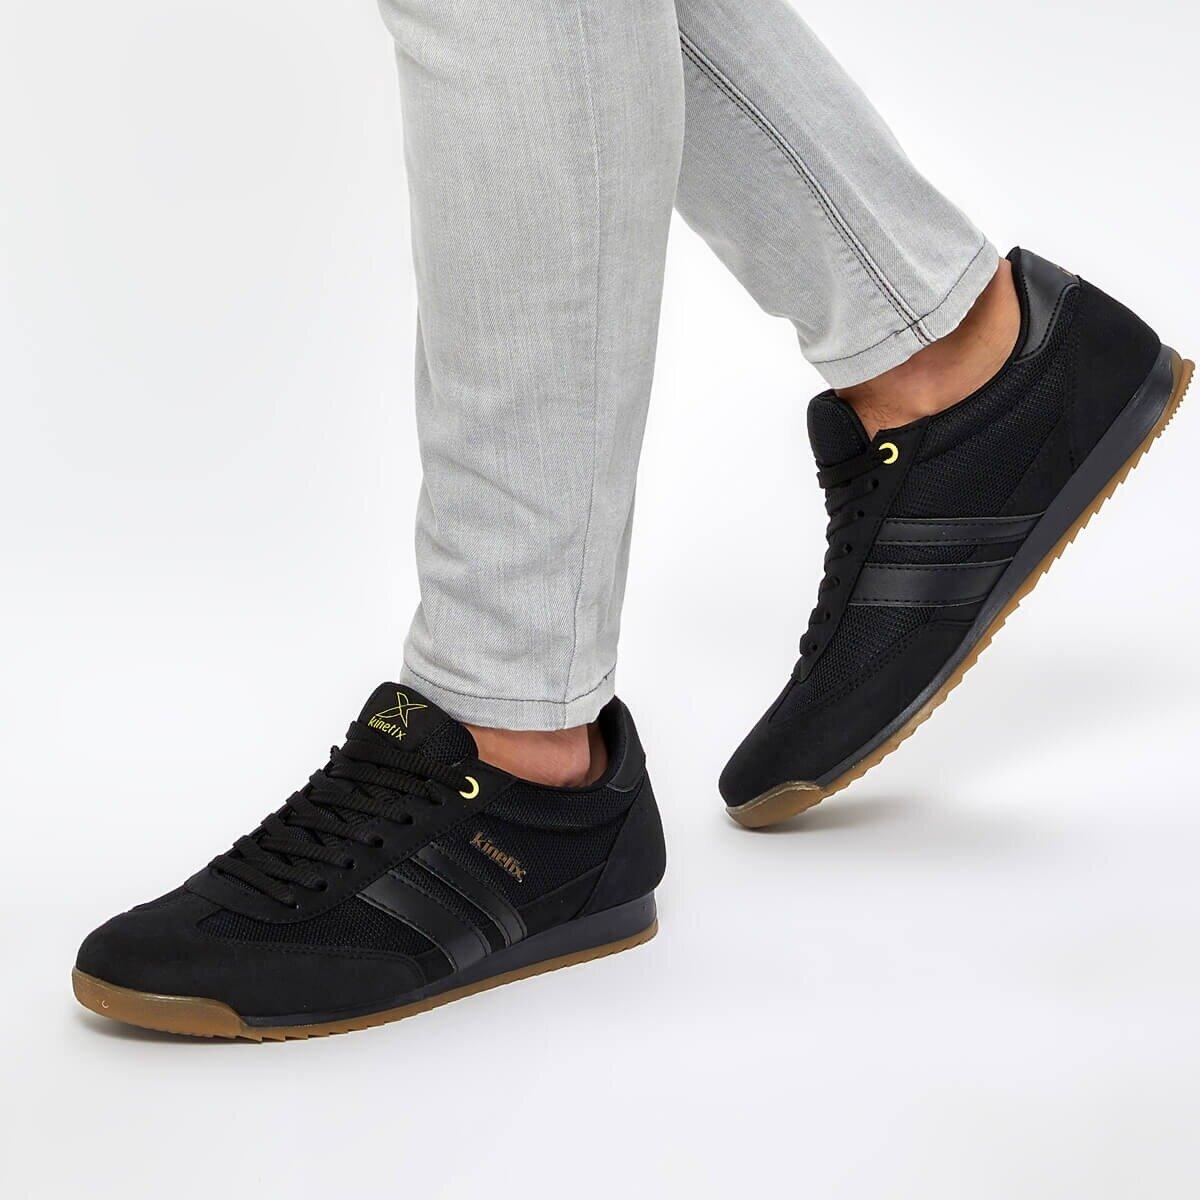 FLO Men Sneakers Lightweight Breathable Zapatillas Man Casual Shoes Couple Footwear Unisex Zapatos Hombre Comfortable Men Sport Sneakers Shoes Мужские кроссовки HALLEY TX M 9PR KINETIX